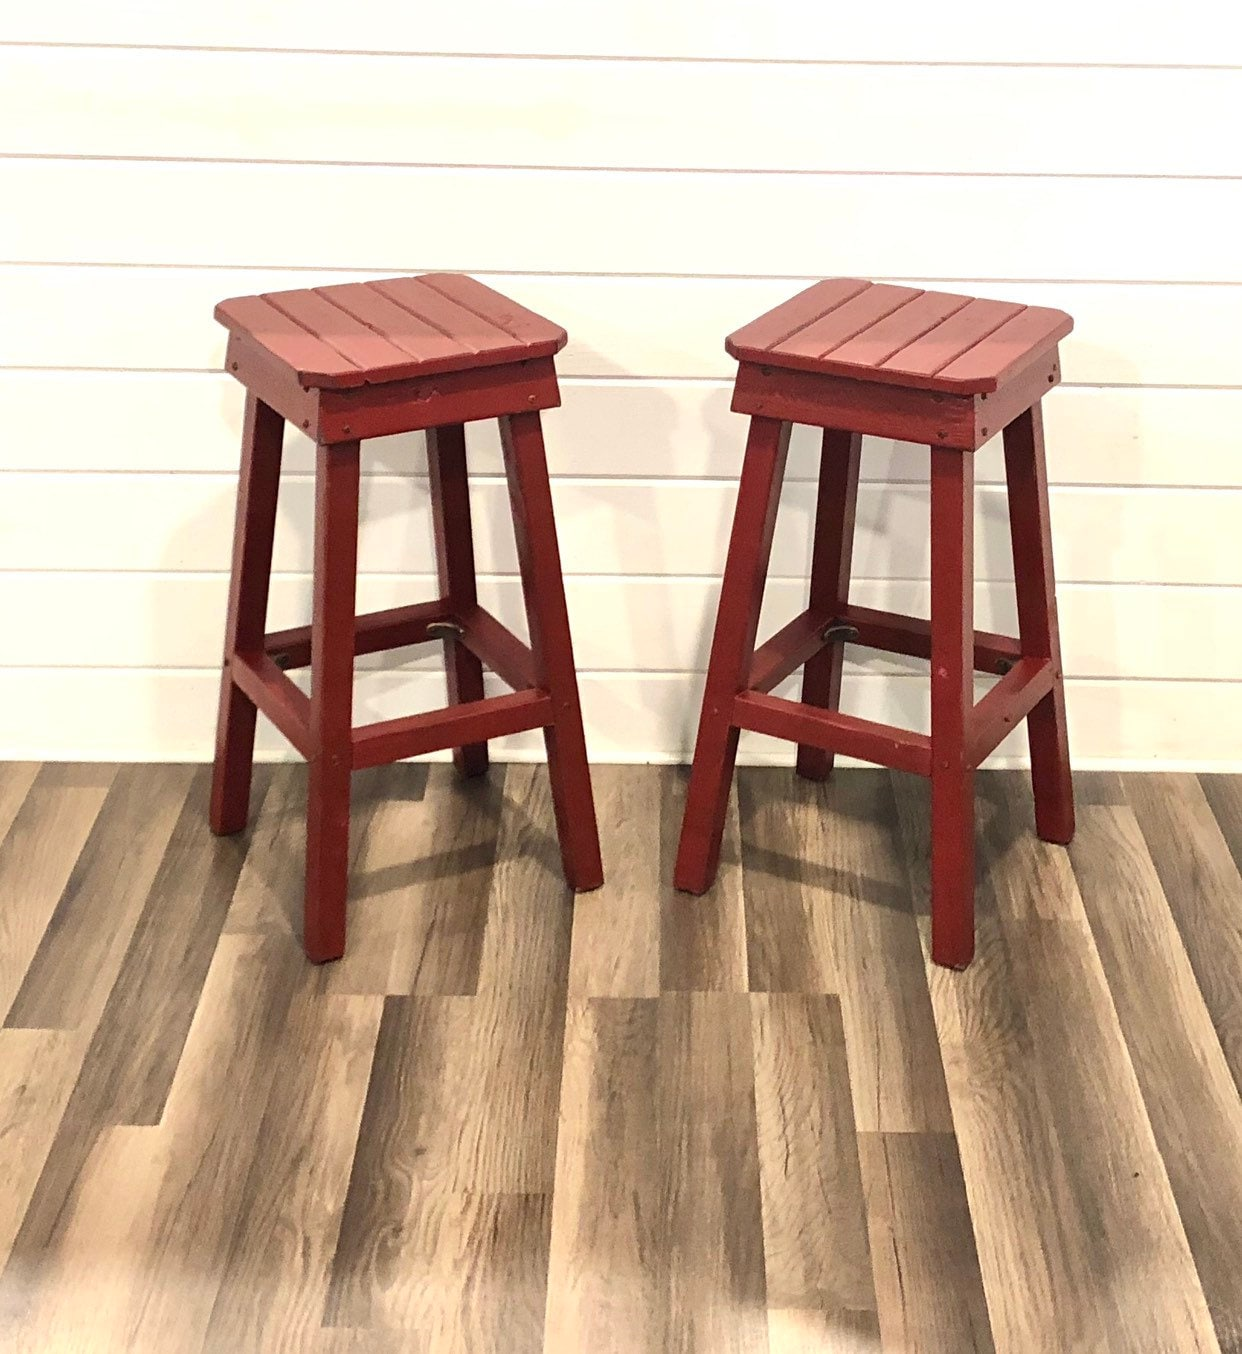 Distressed Bar Stool Set/Two Vintage Stools/Farmhouse Style Barstools/2 Bohemian Style Stools/Shabby Chic/Custom Height/White Stools for sale